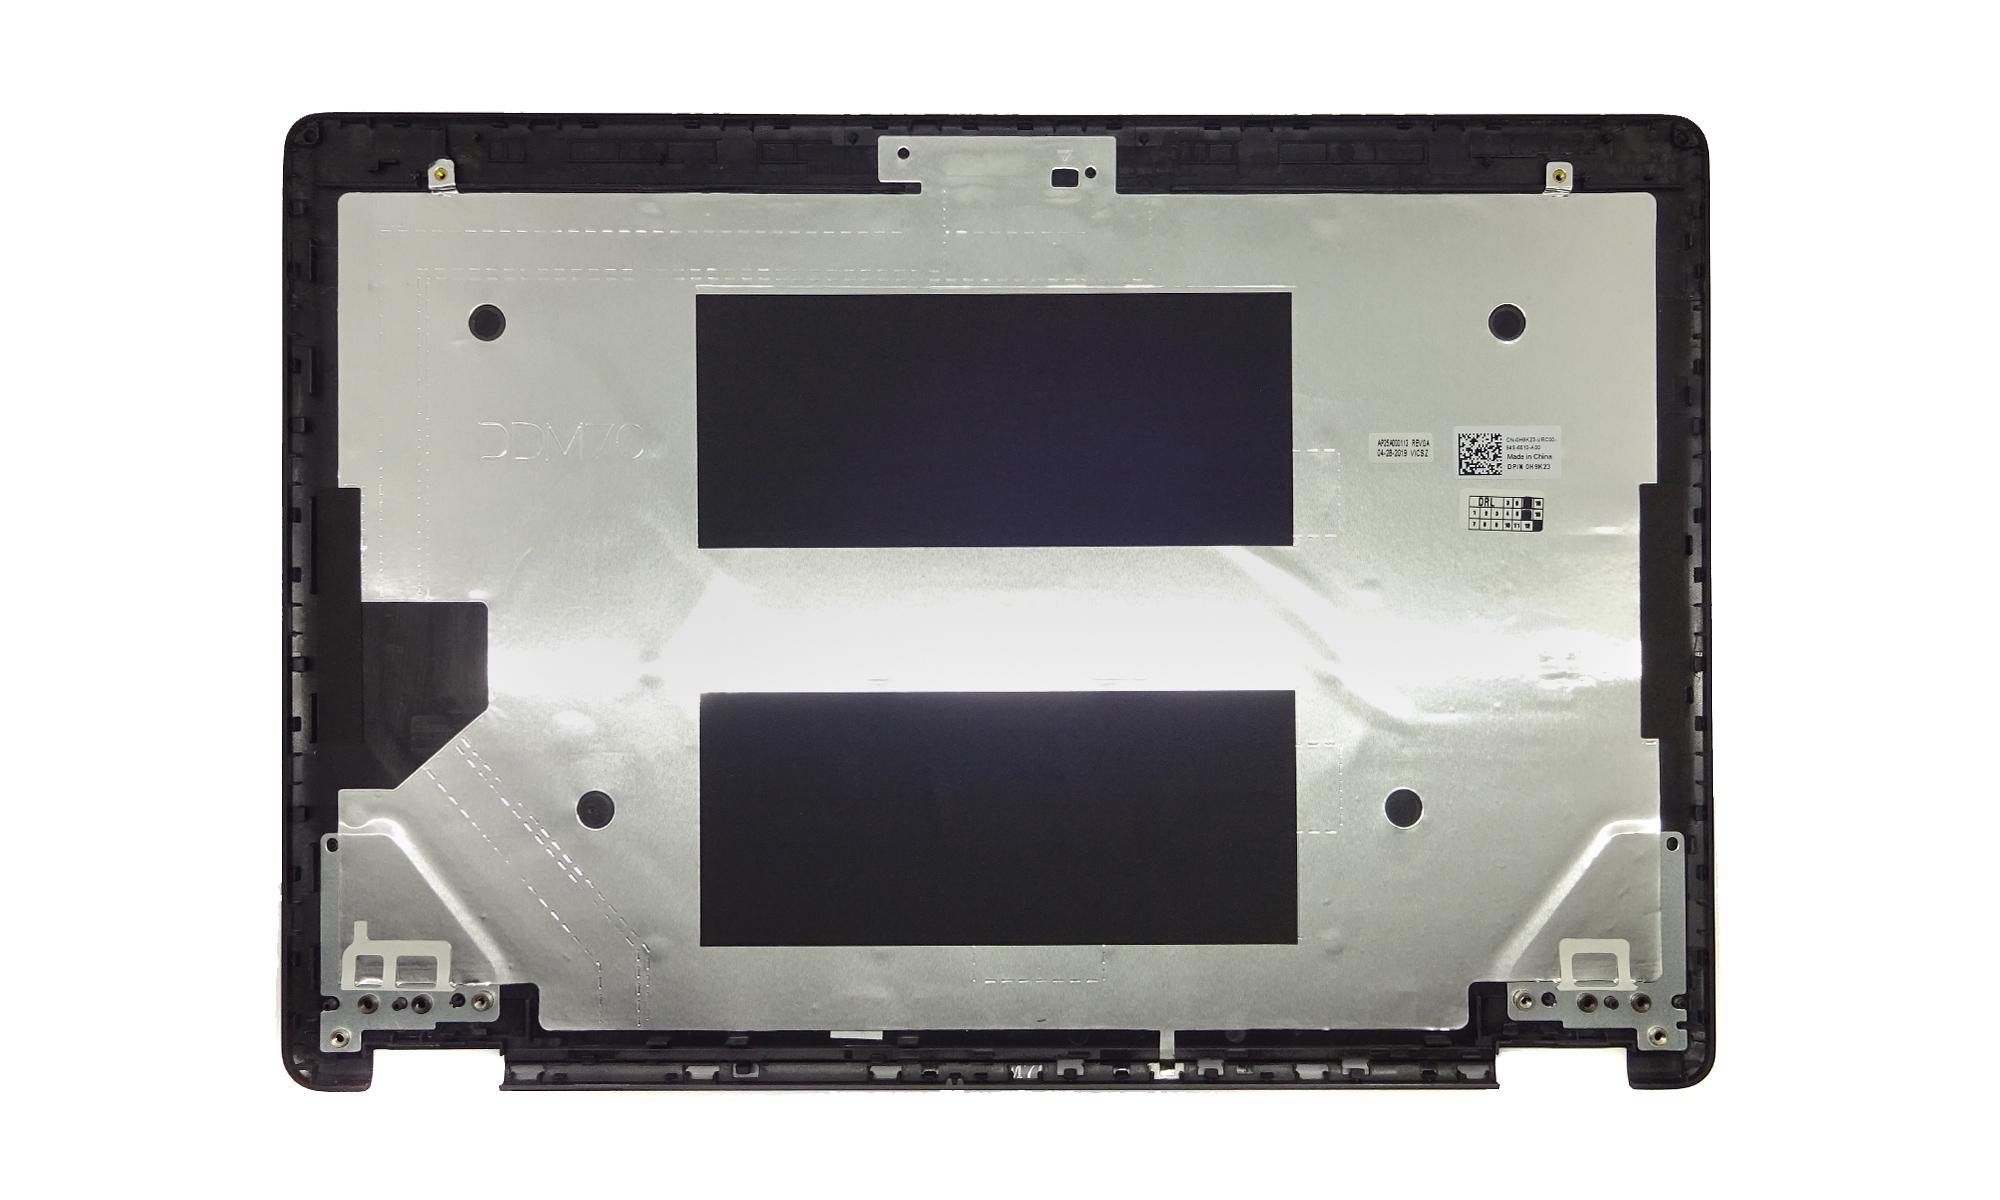 Capac display pentru Dell Latitude 5480, 5490 compatibil, negru